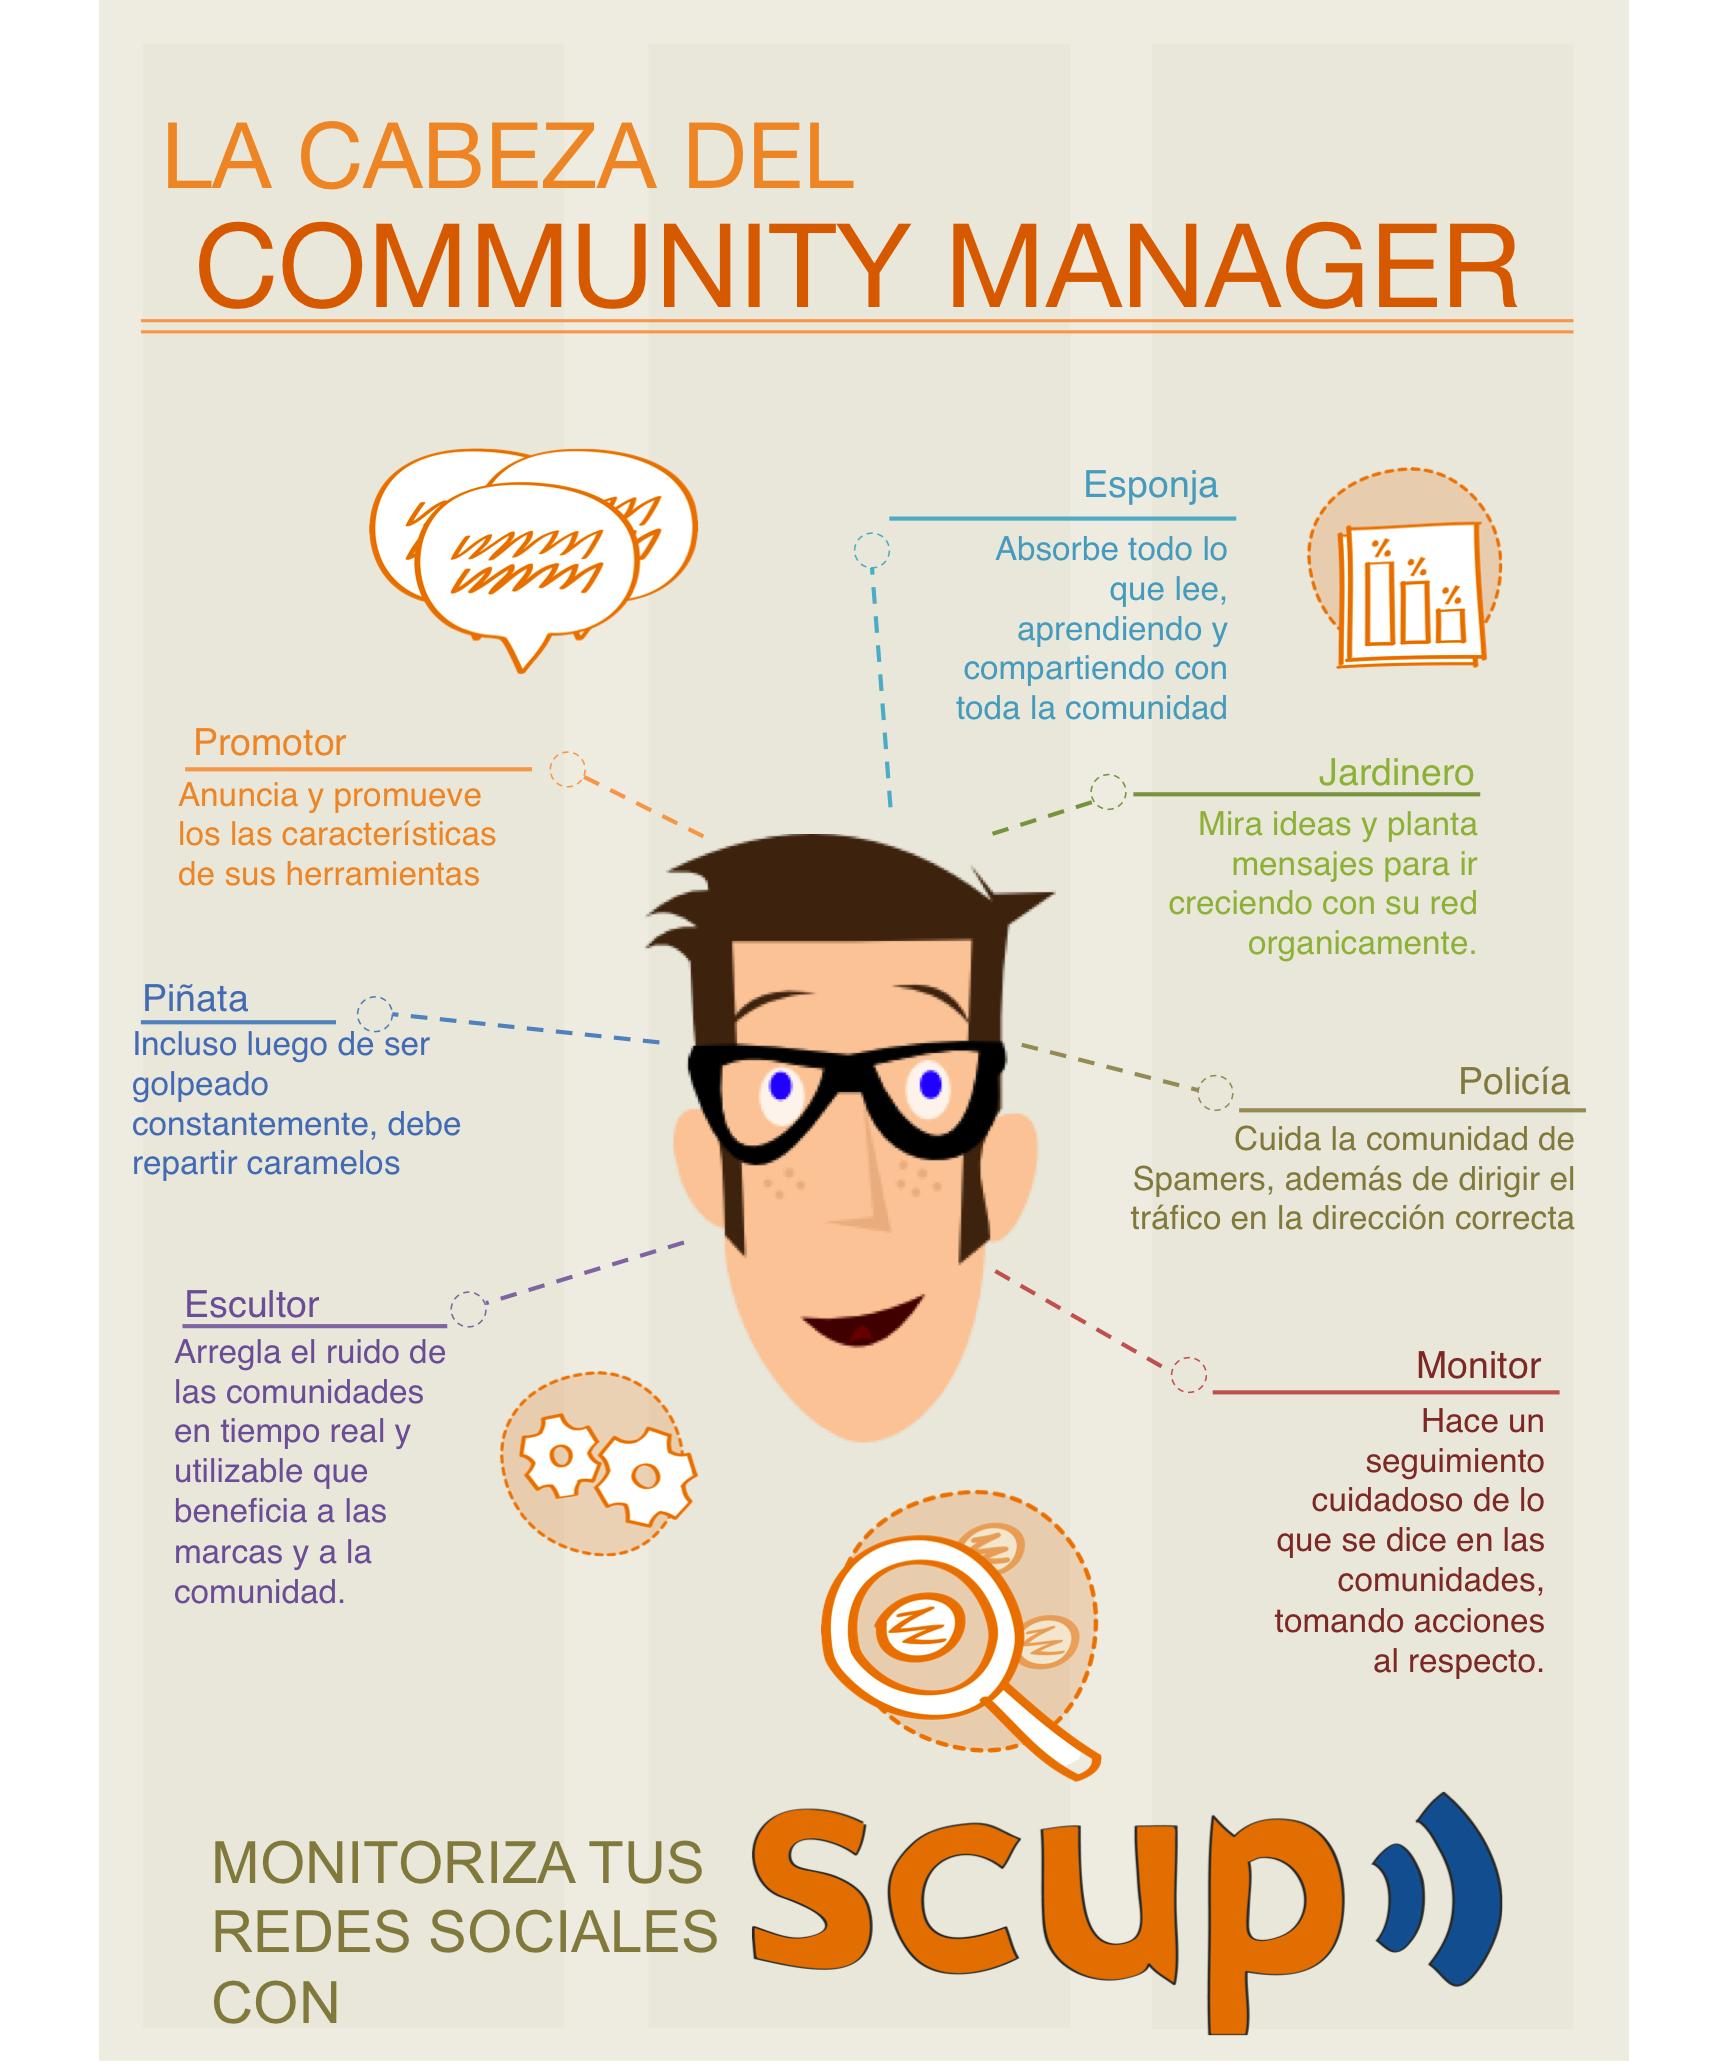 Infografia - La cabeza de un Community Manager #infografia #infographic #socialmedia - TICs y Formación